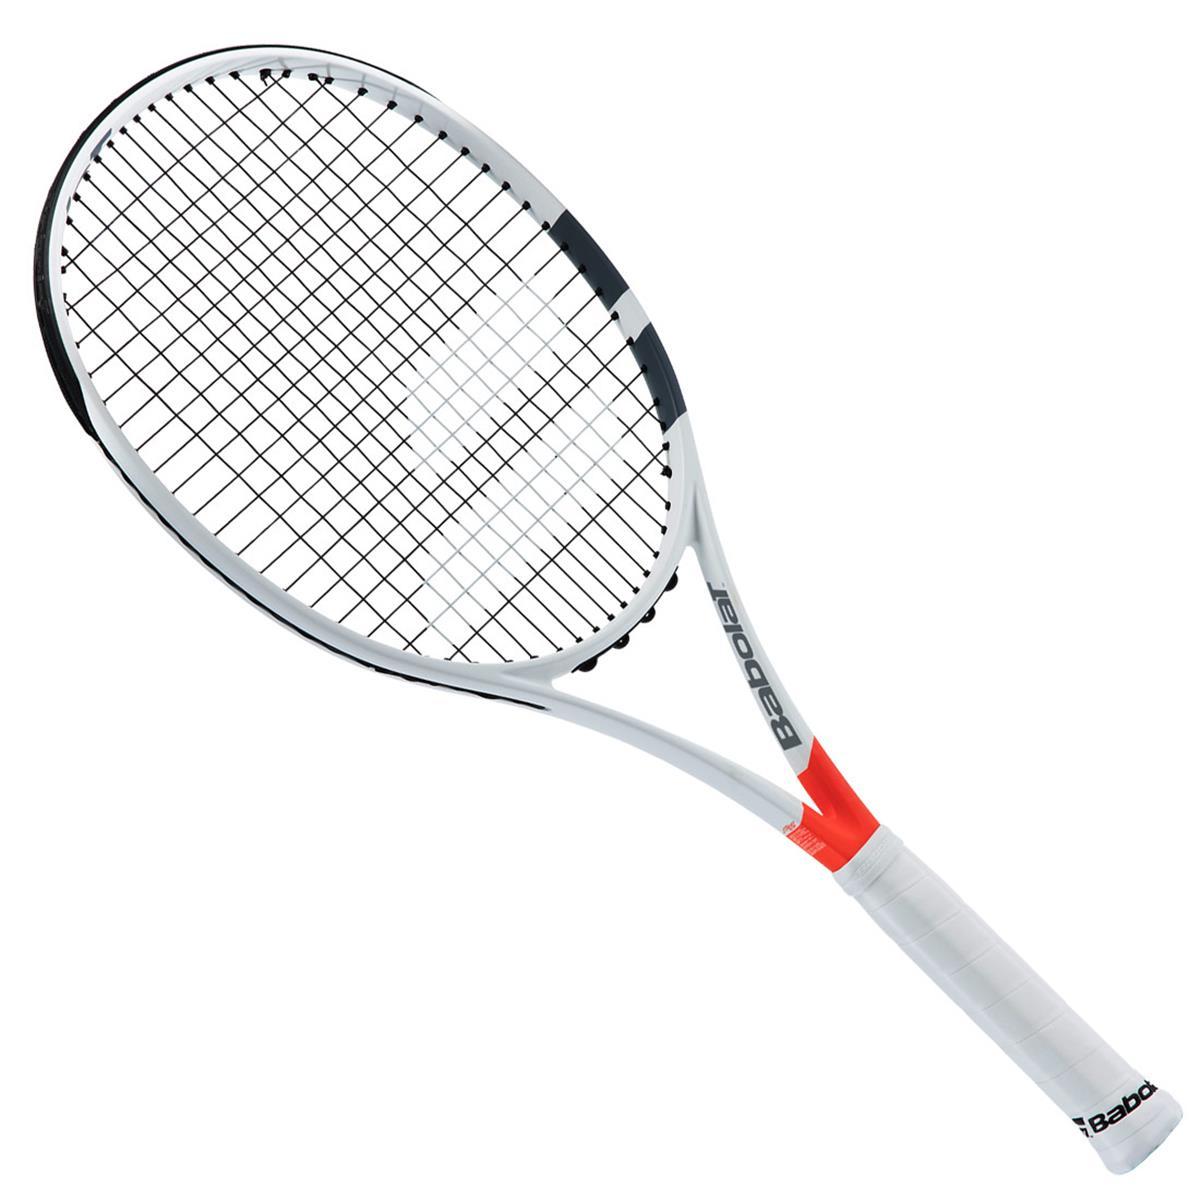 babolat pure strike team tennis racket direct tennis. Black Bedroom Furniture Sets. Home Design Ideas